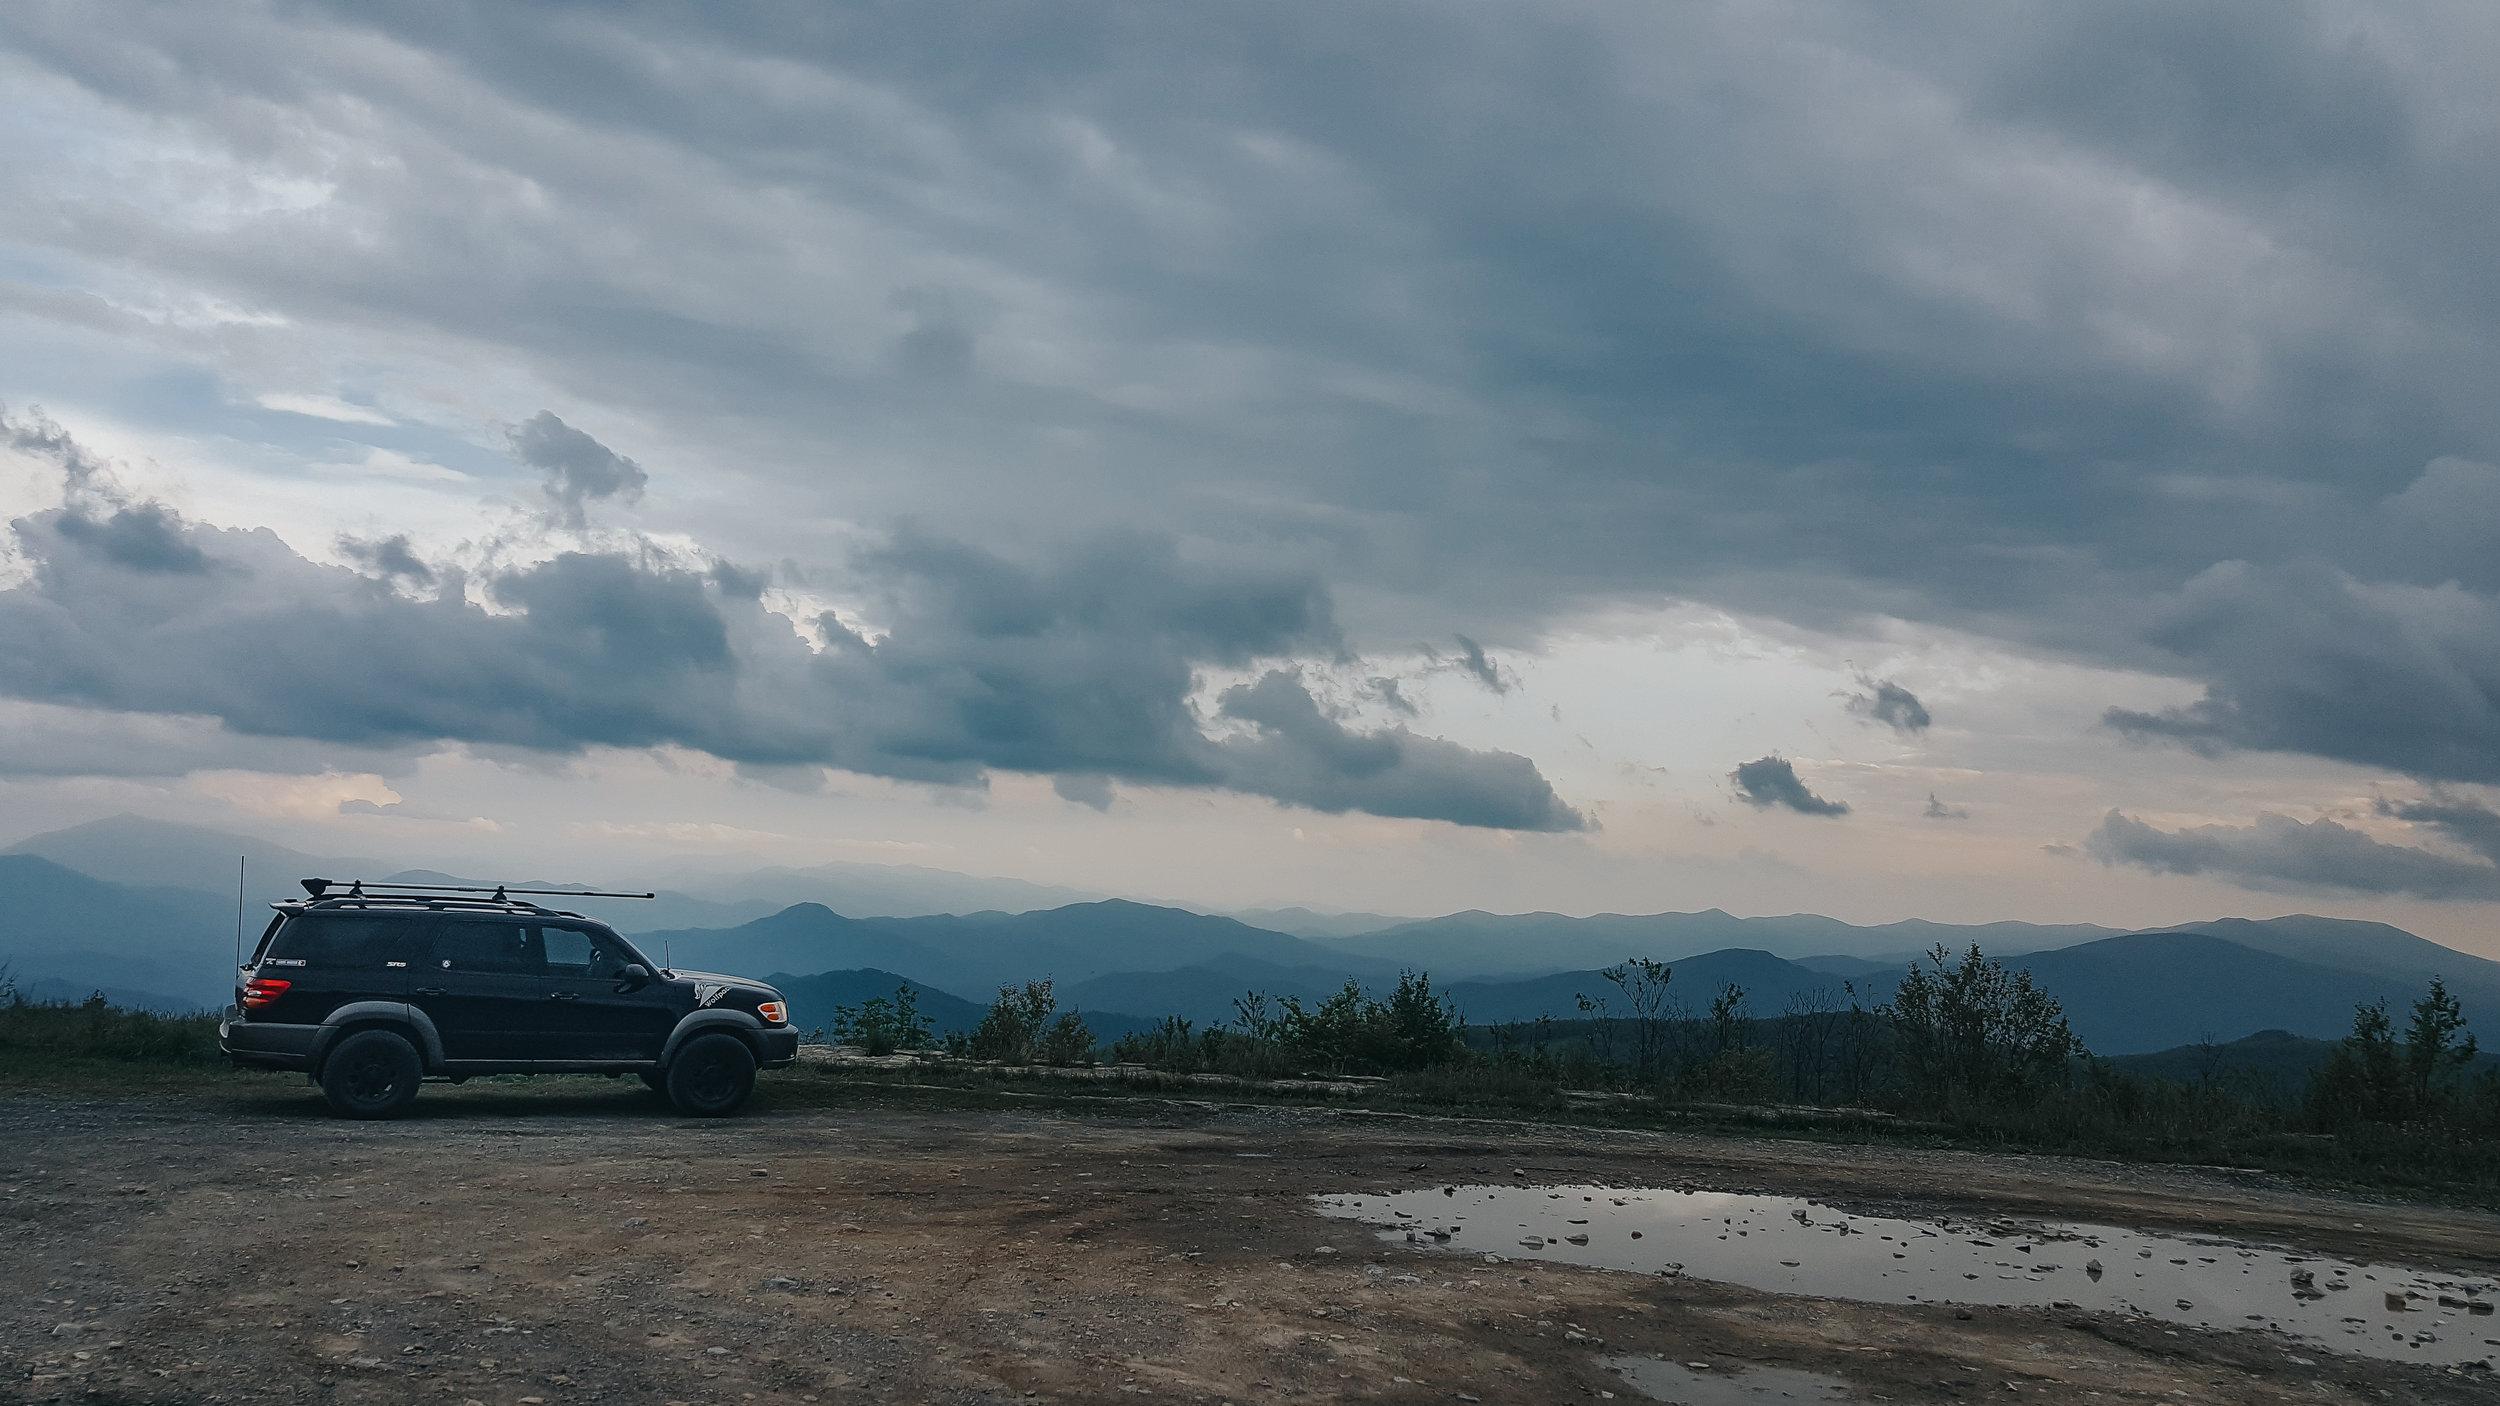 east tennesse- unaka mountain- wolfpack overland- sequioa- sunset- explore